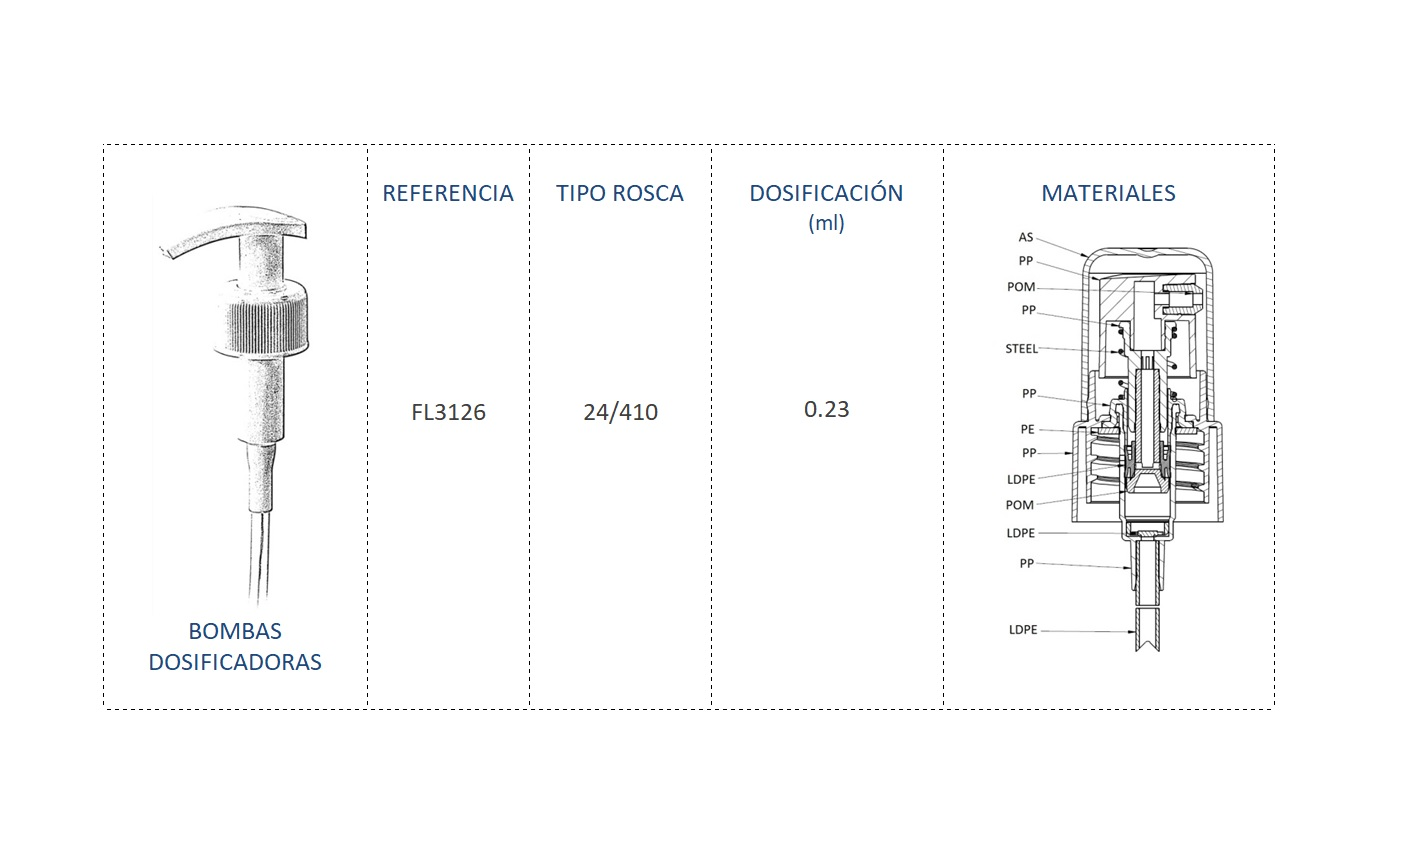 Cuadro de materiales bomba dosificadora FL3126 24-410